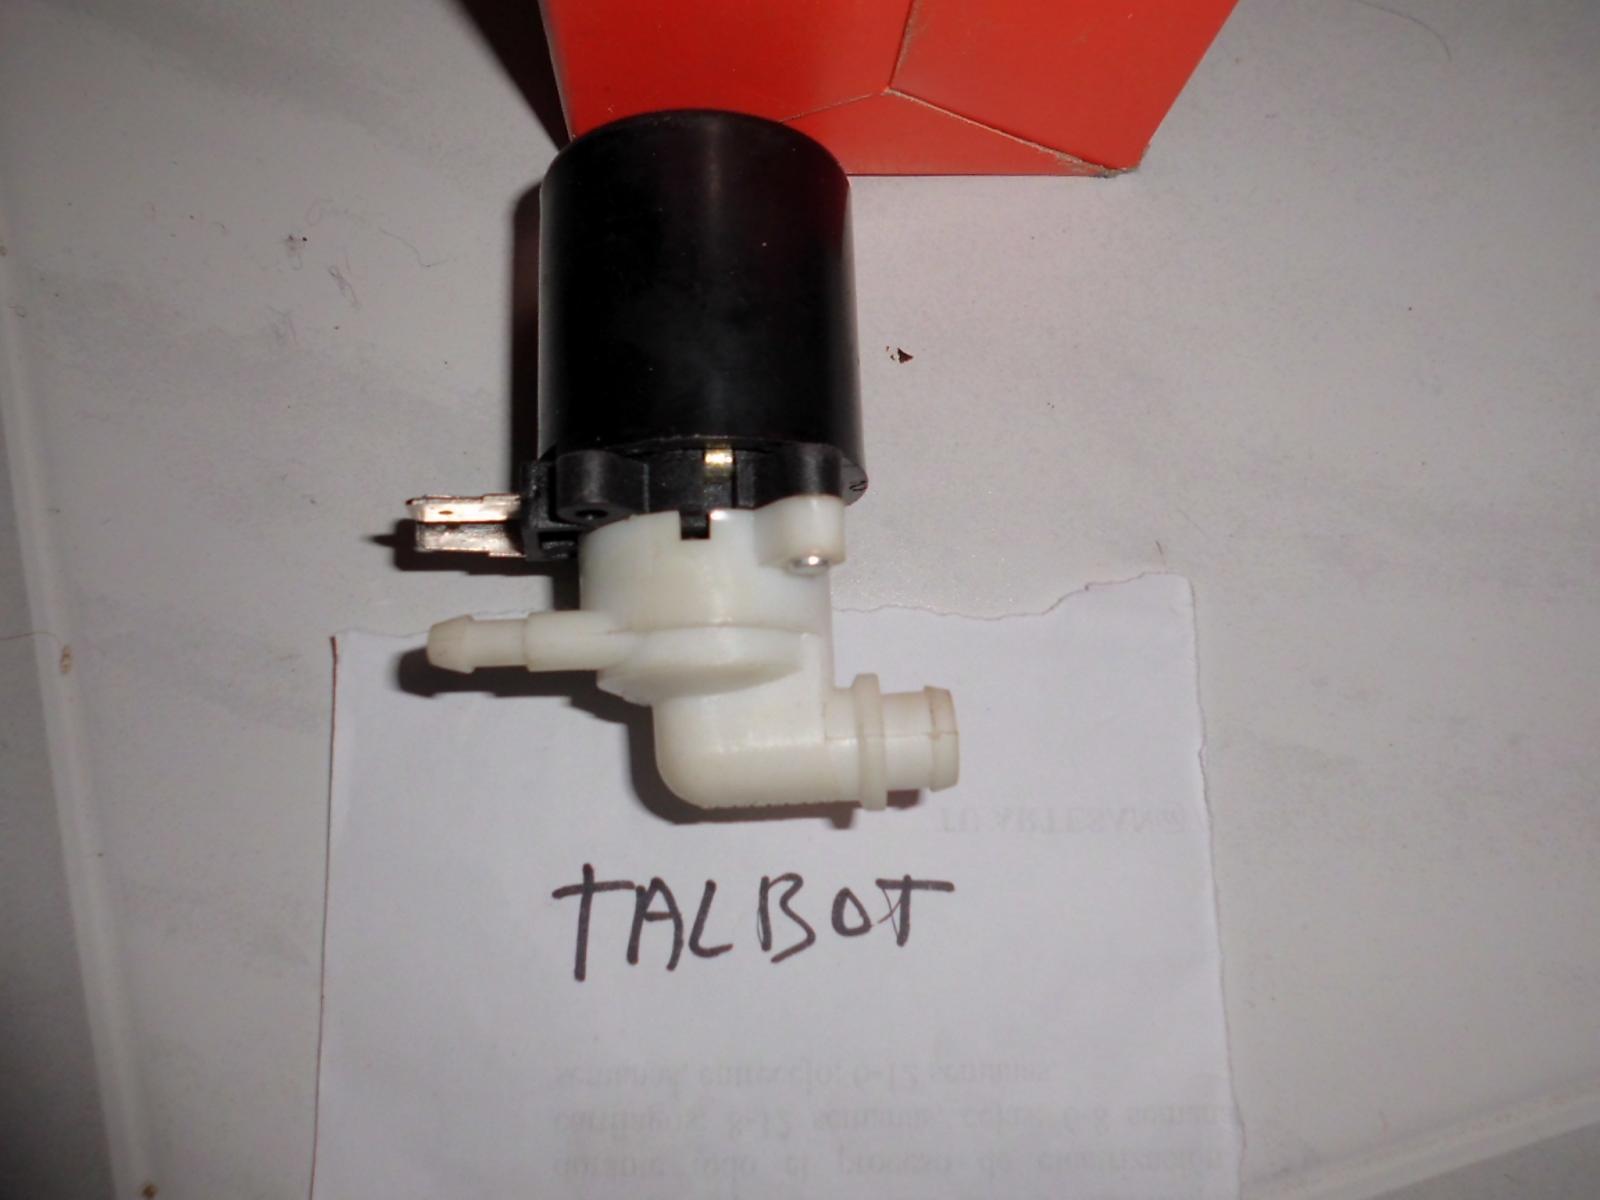 Bomba chorritos de Talbot Horizon